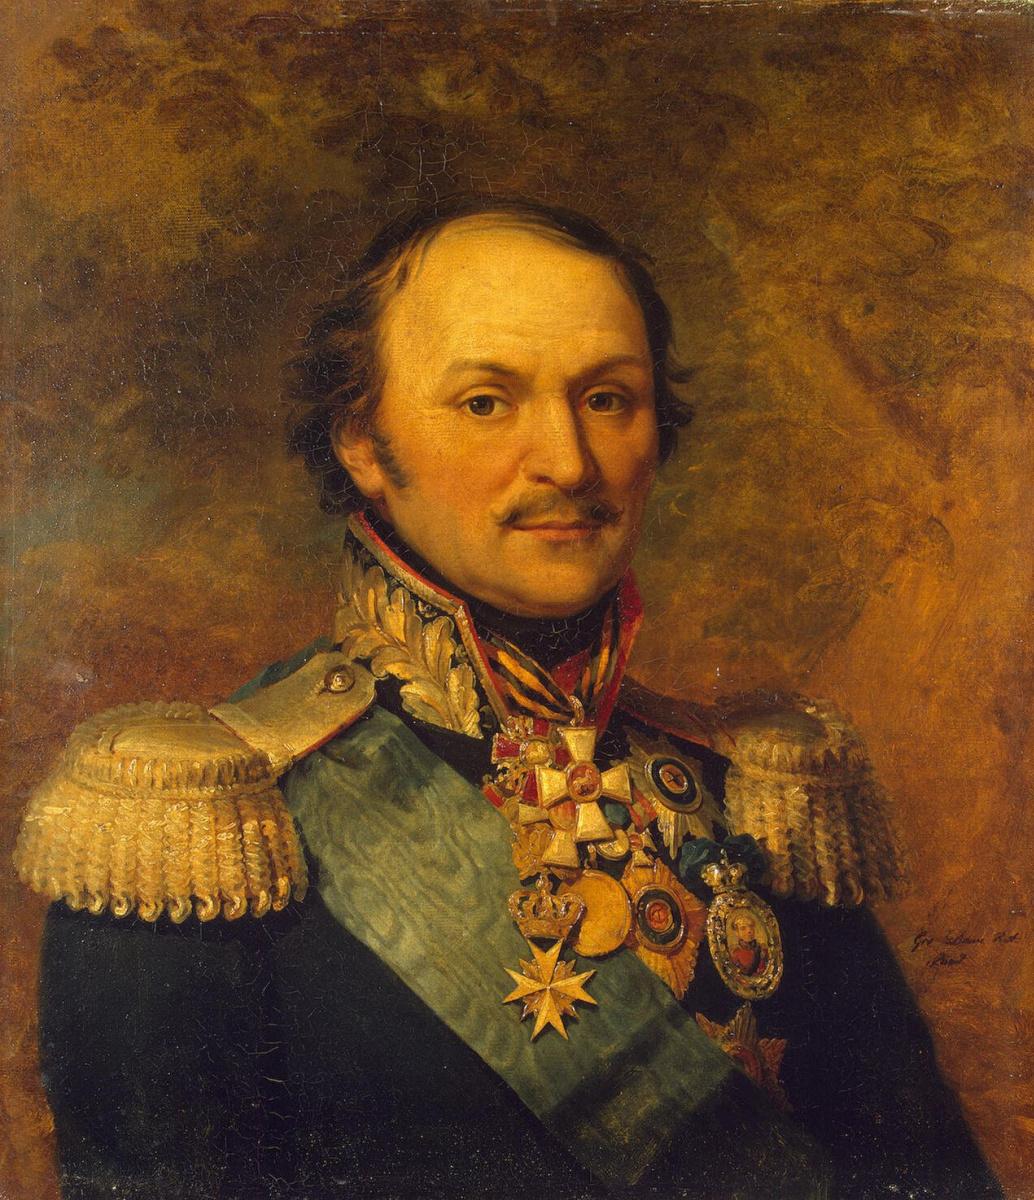 Джордж Доу. Портрет Матвея Ивановича Платова